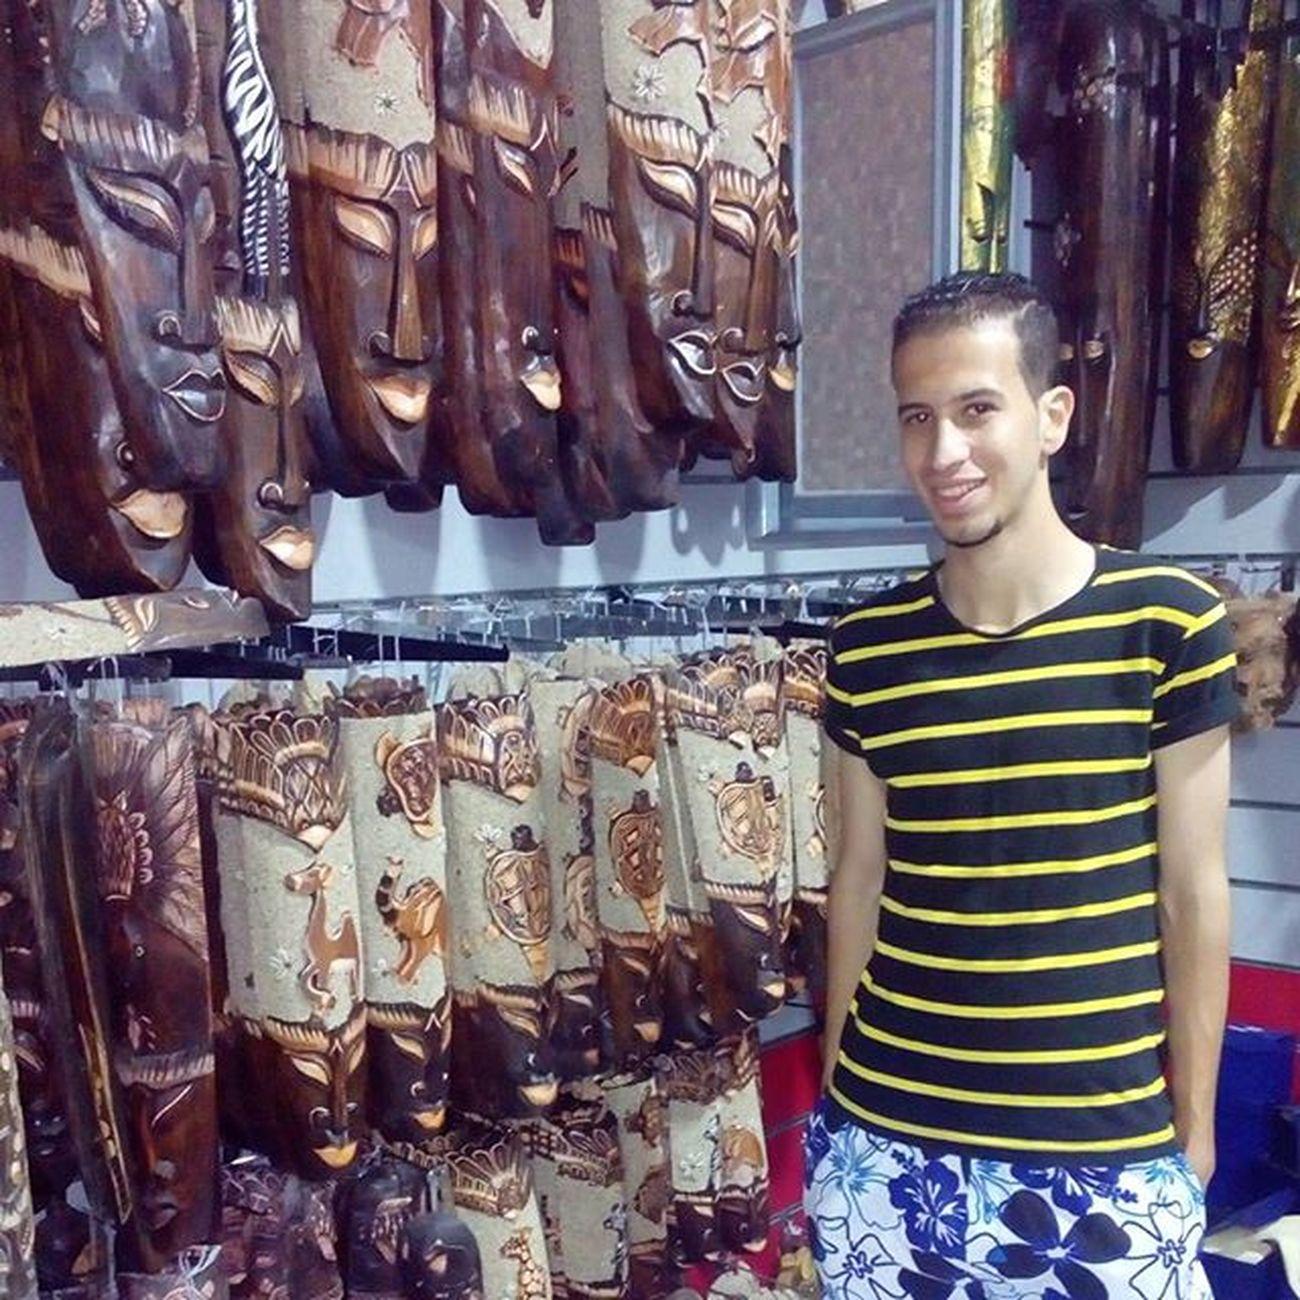 Summer_holiday Bazar African_faces Nice_shot Instafun Instarelax